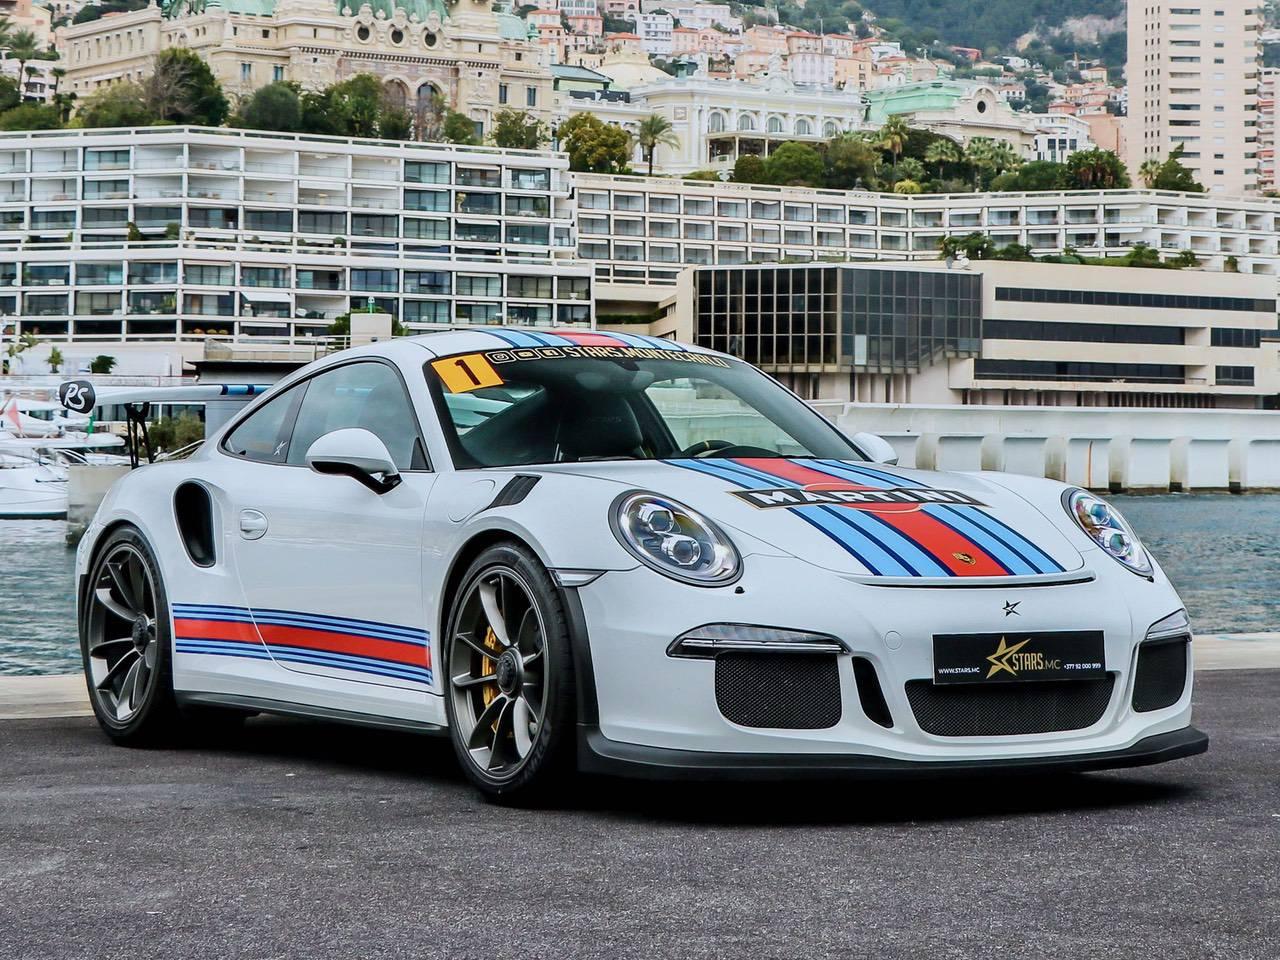 Porsche-991-Coupè-991-PDK-GT3-RS-Martini-3